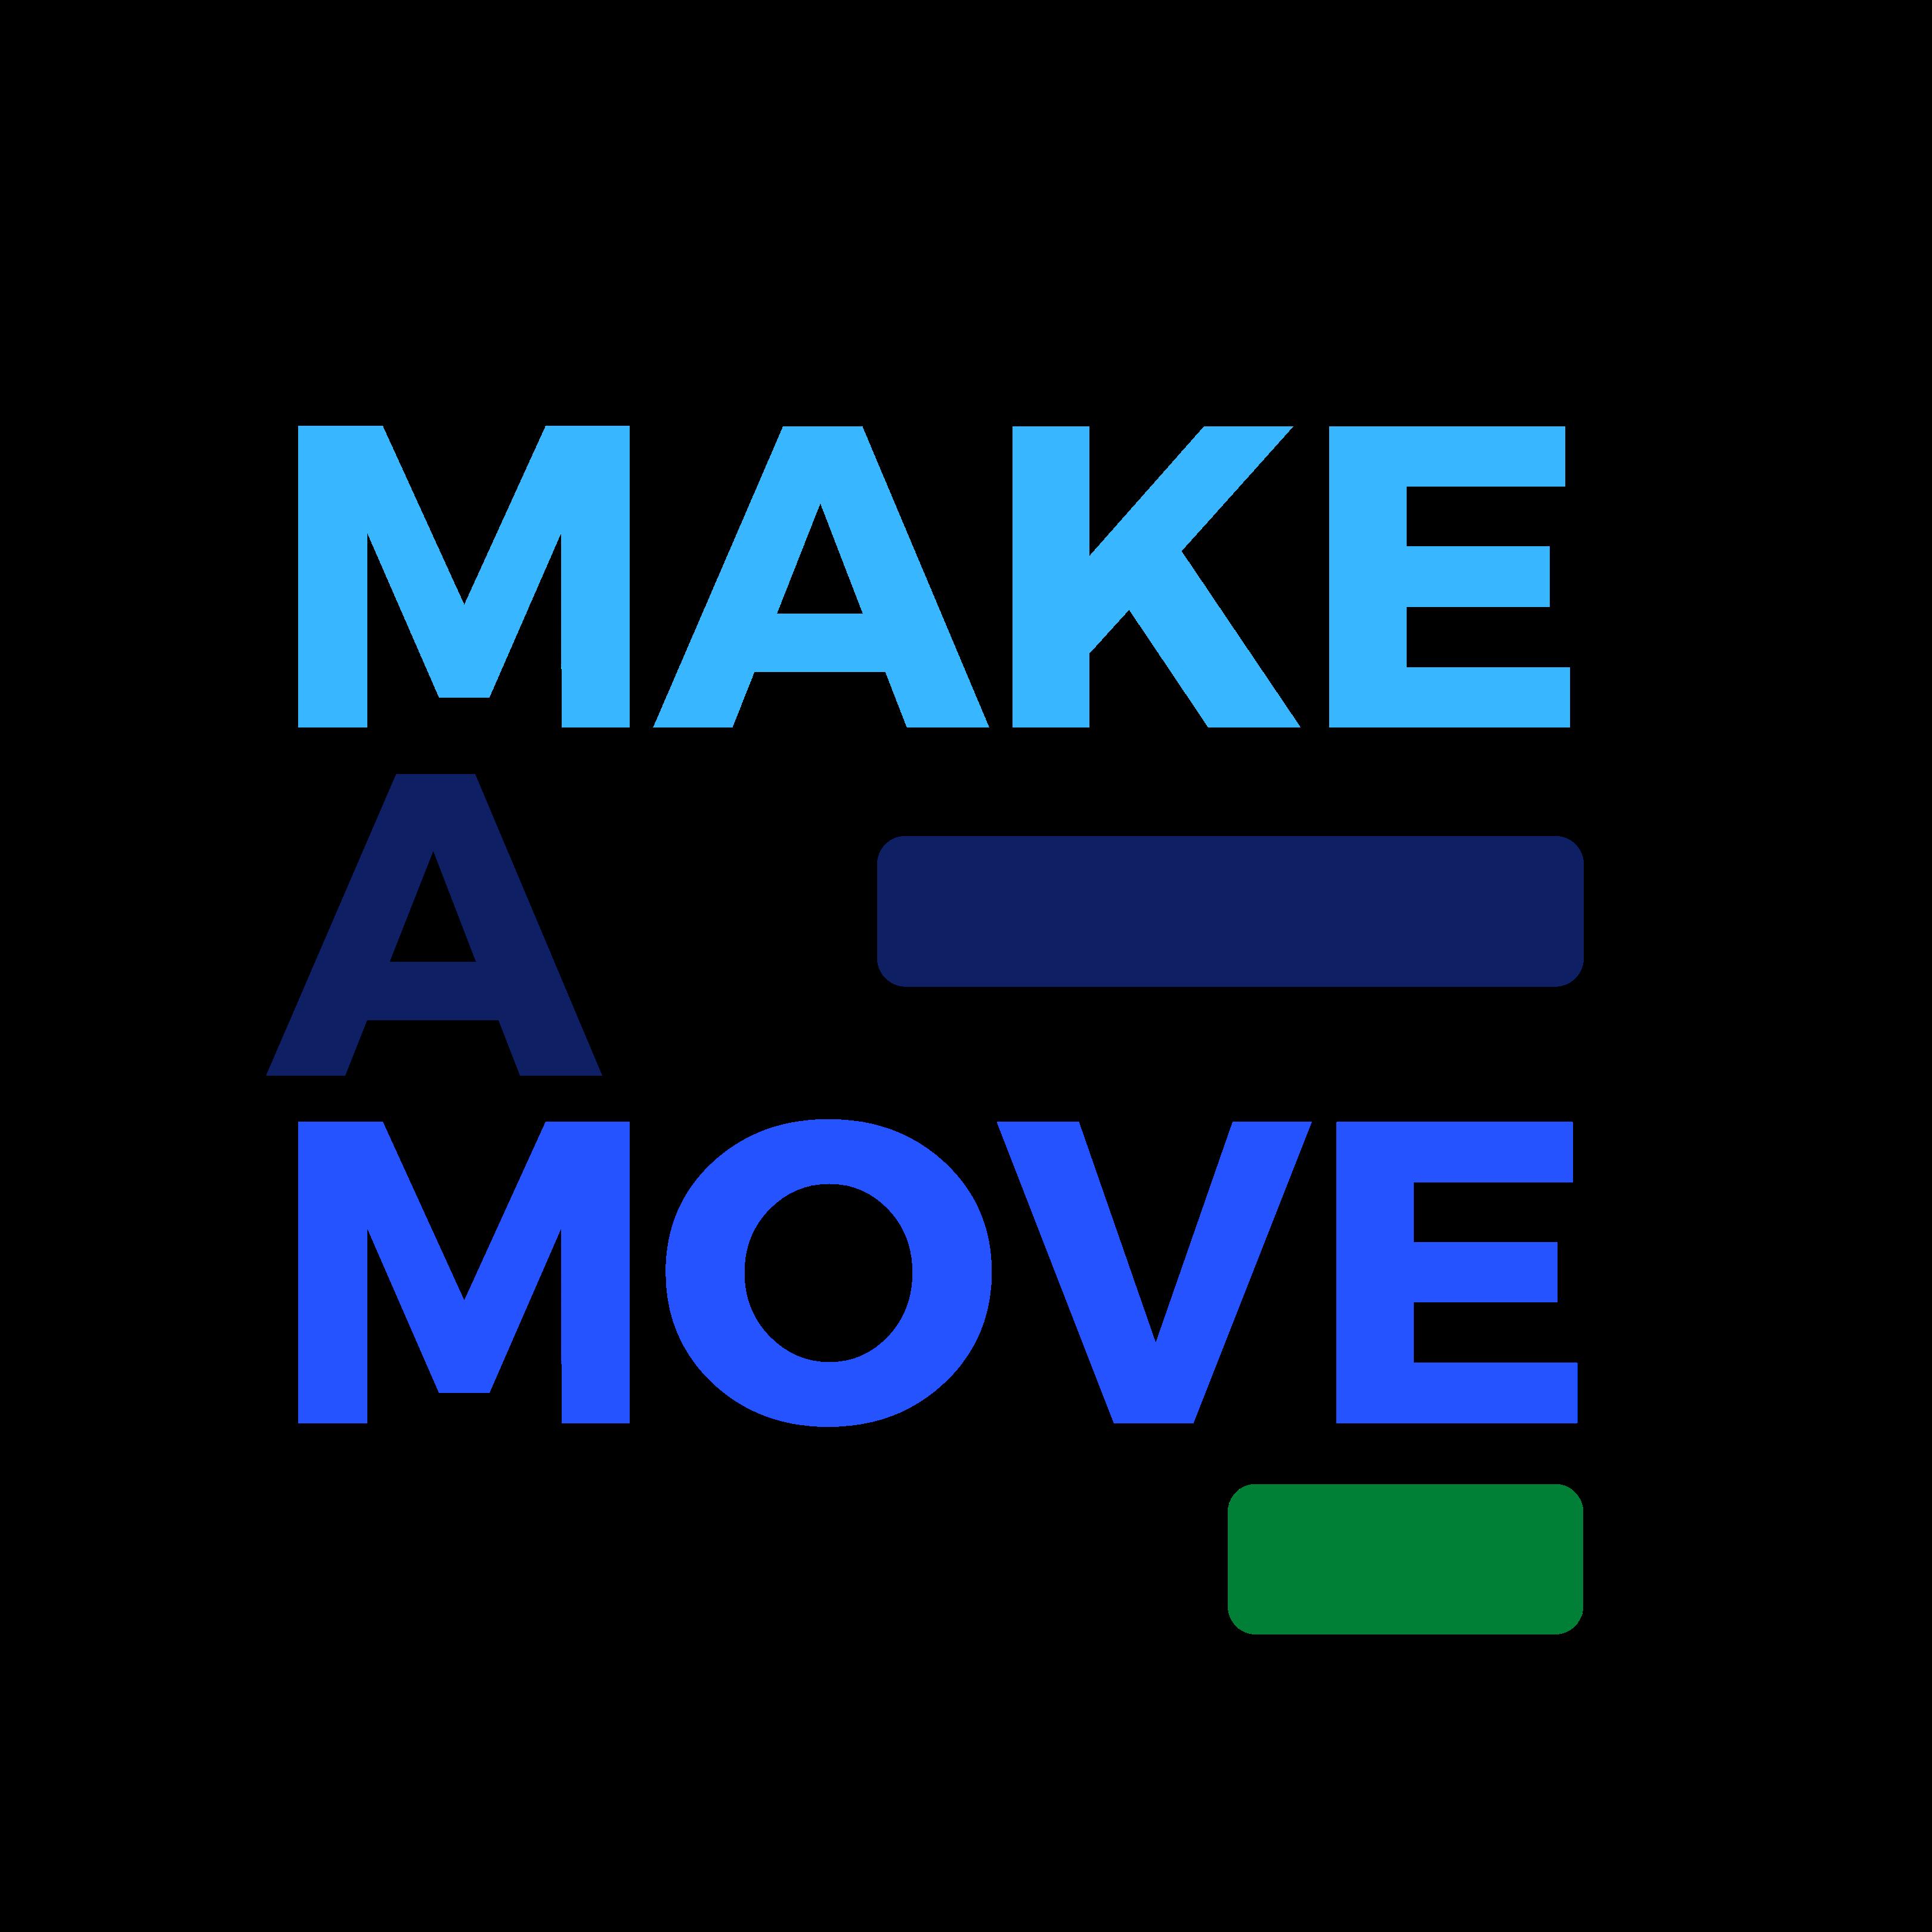 Make a move logo png